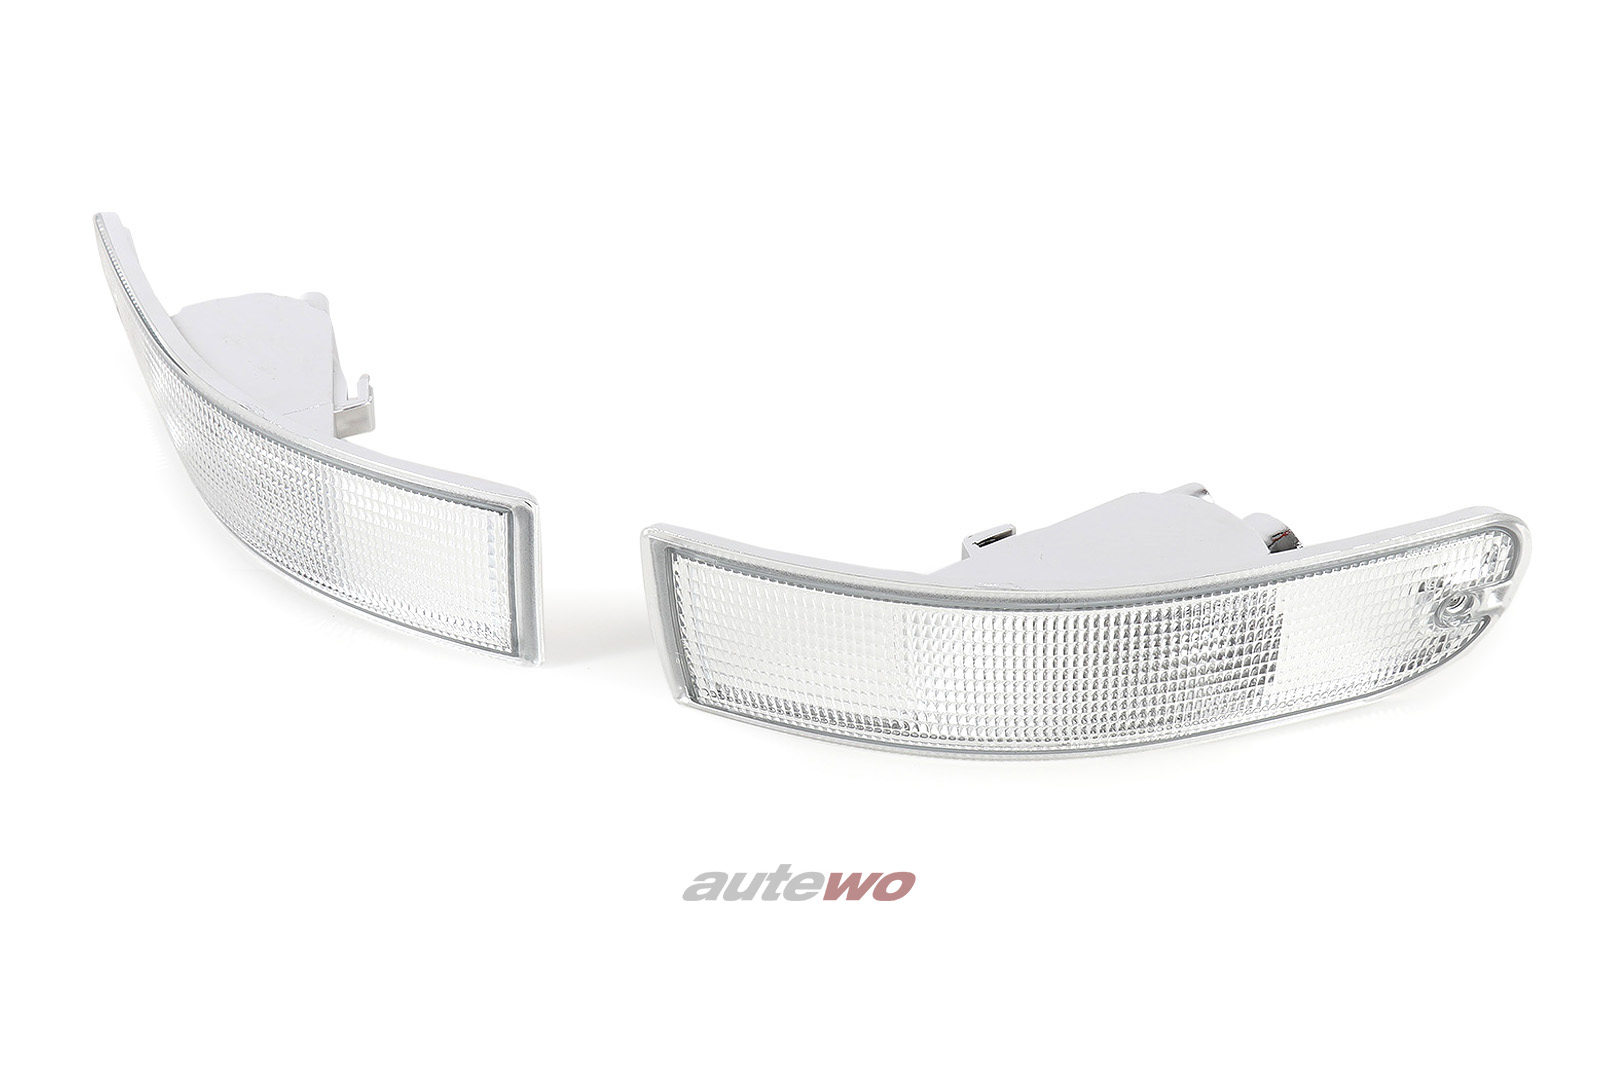 NEU Audi RS2 P1/80 Cabrio Typ 89 Blinker Paar weiß ersetzt 8G0953049/8G0953050